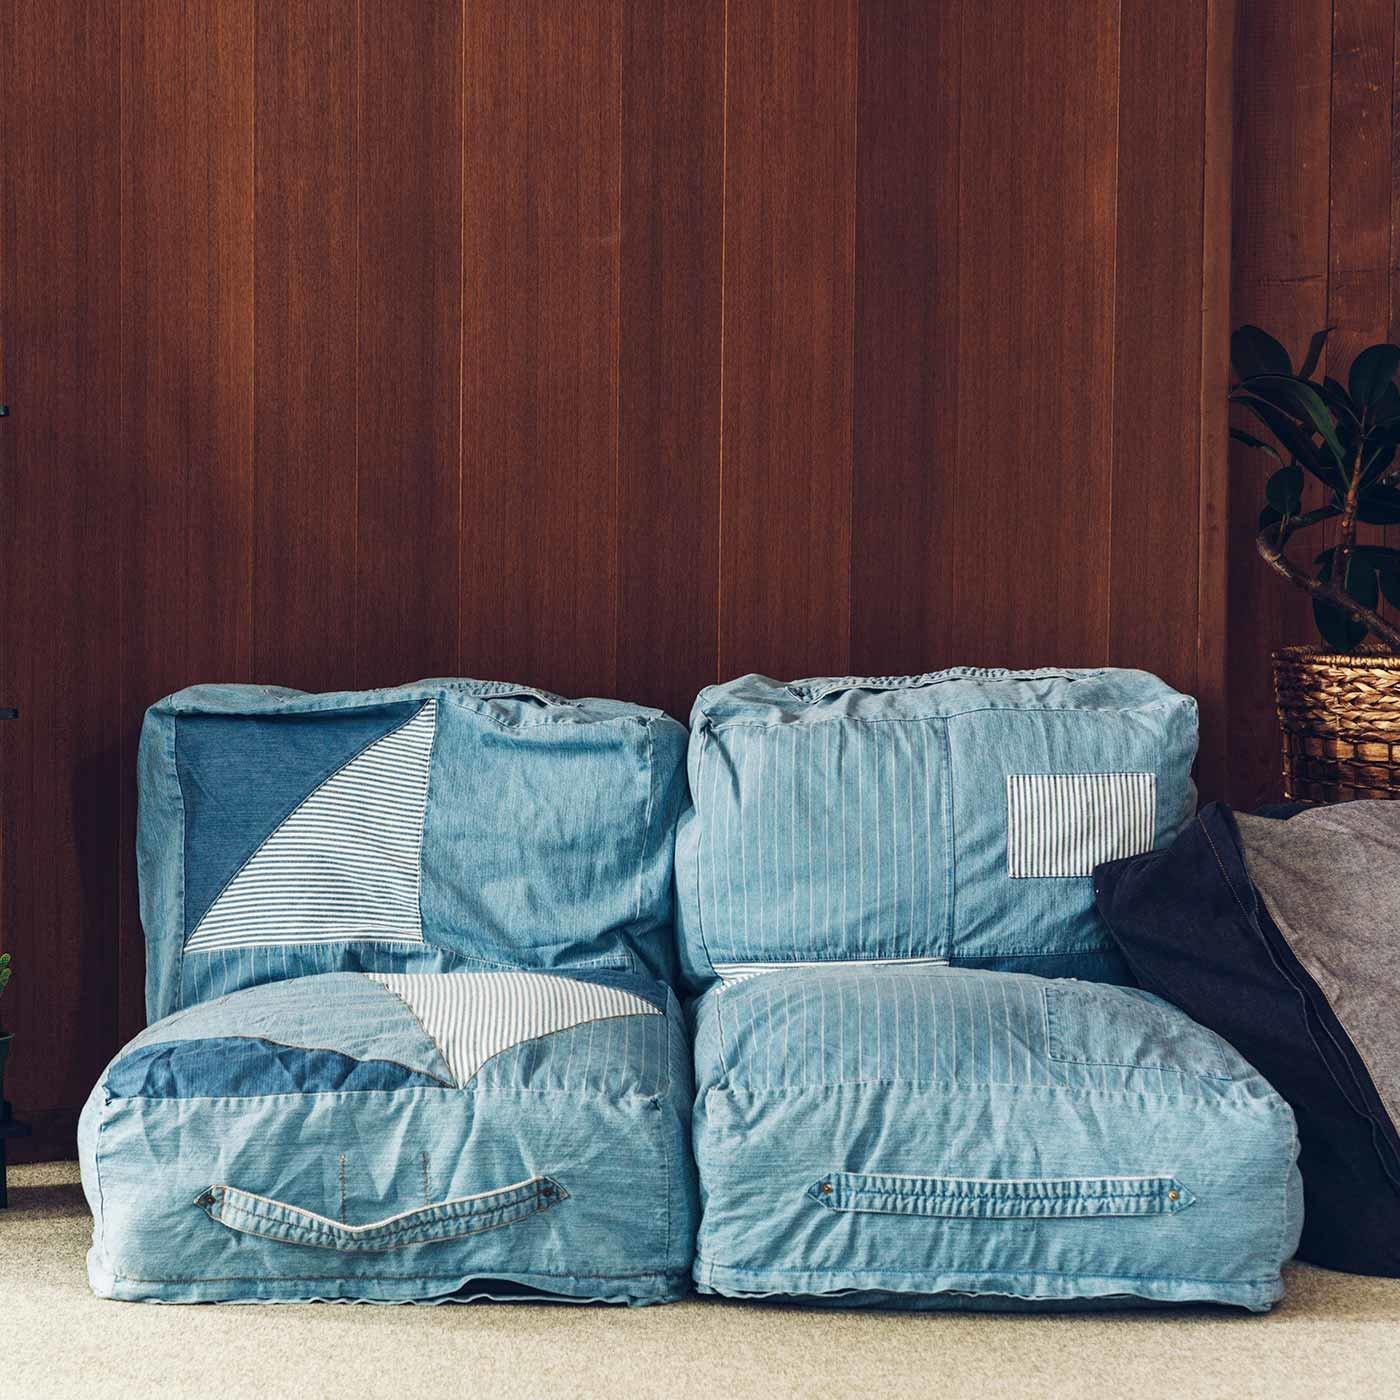 RoomClip商品情報 - 古着屋さんで見つけたような ユーズド加工のくたくた収納デニムザブトンの会 フェリシモ FELISSIMO【送料無料】